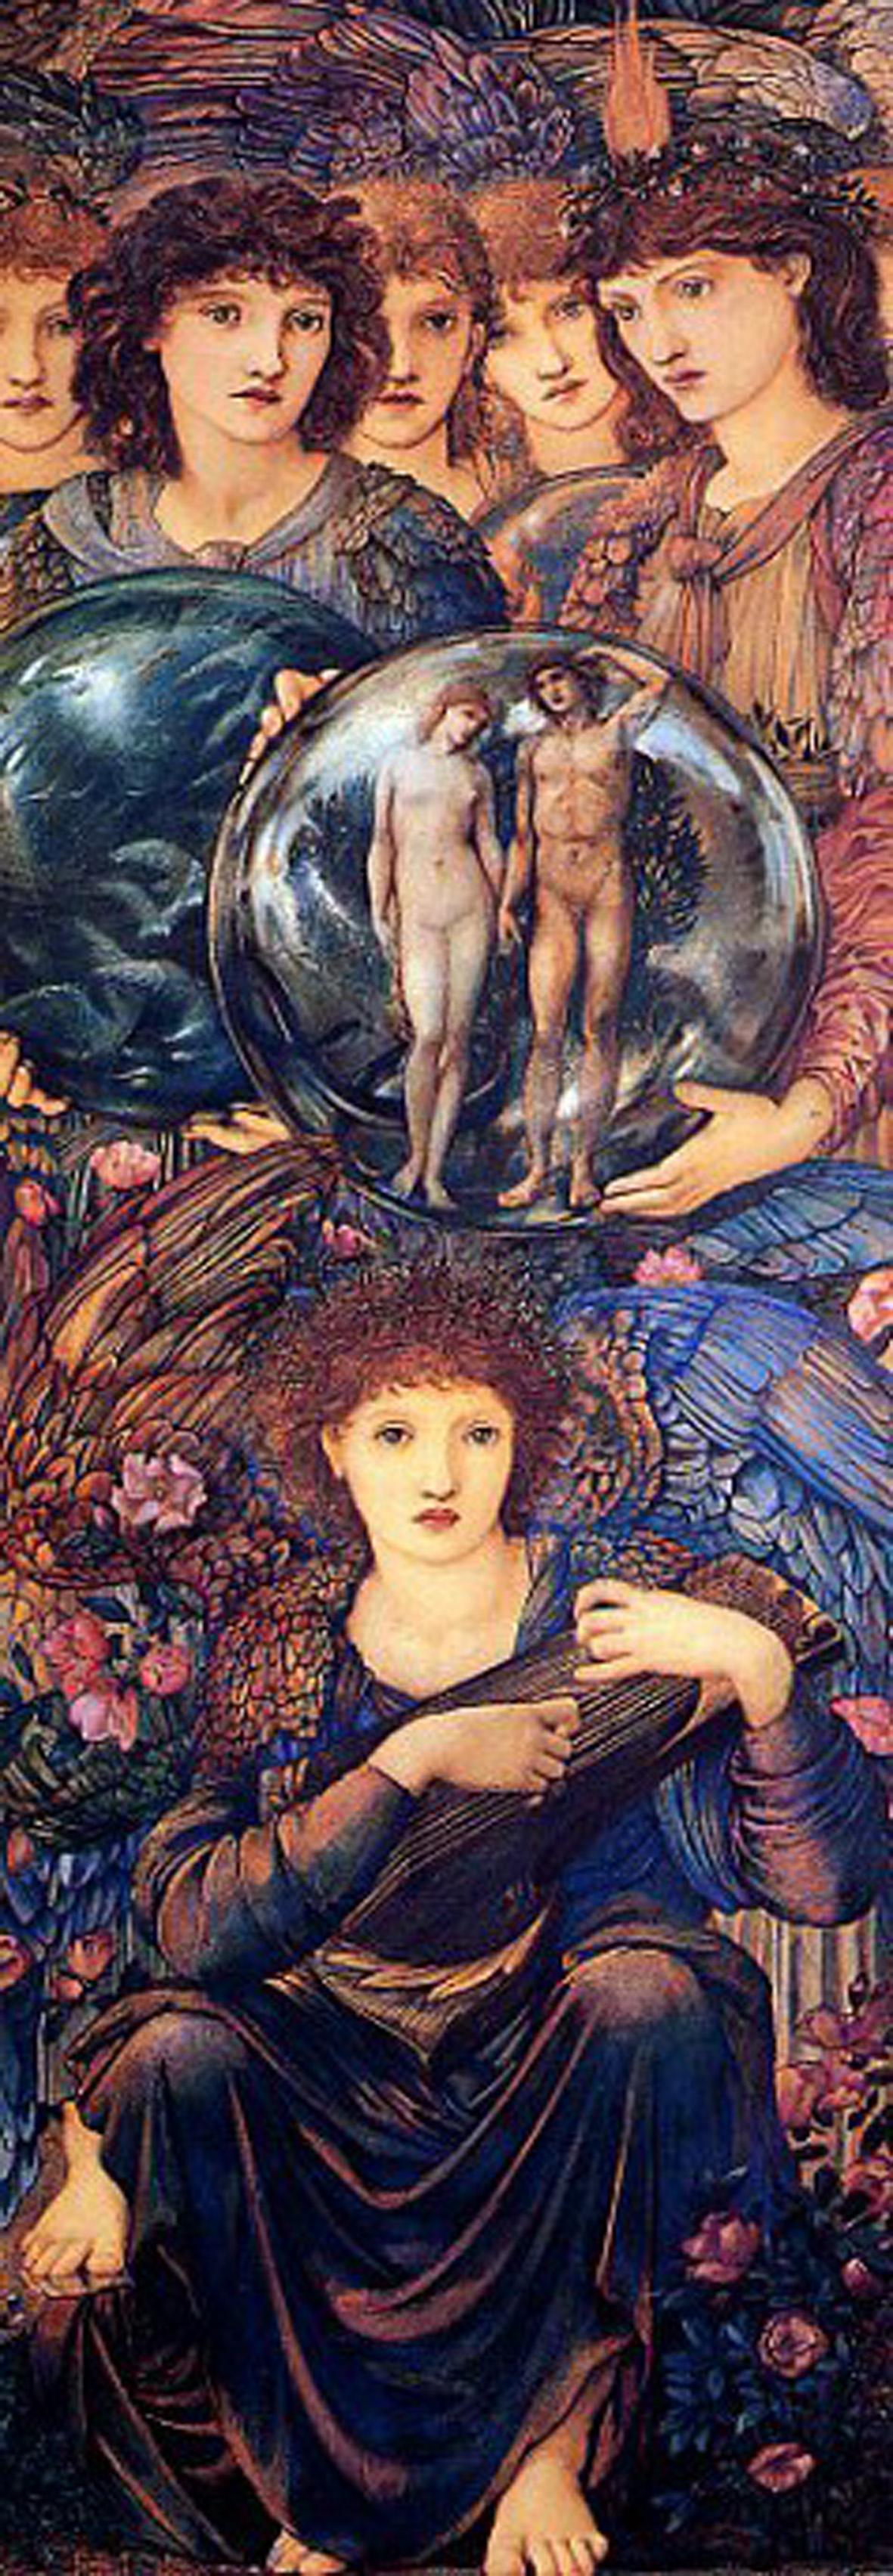 3002N00013 - Burne-Jones, Edward -Angels